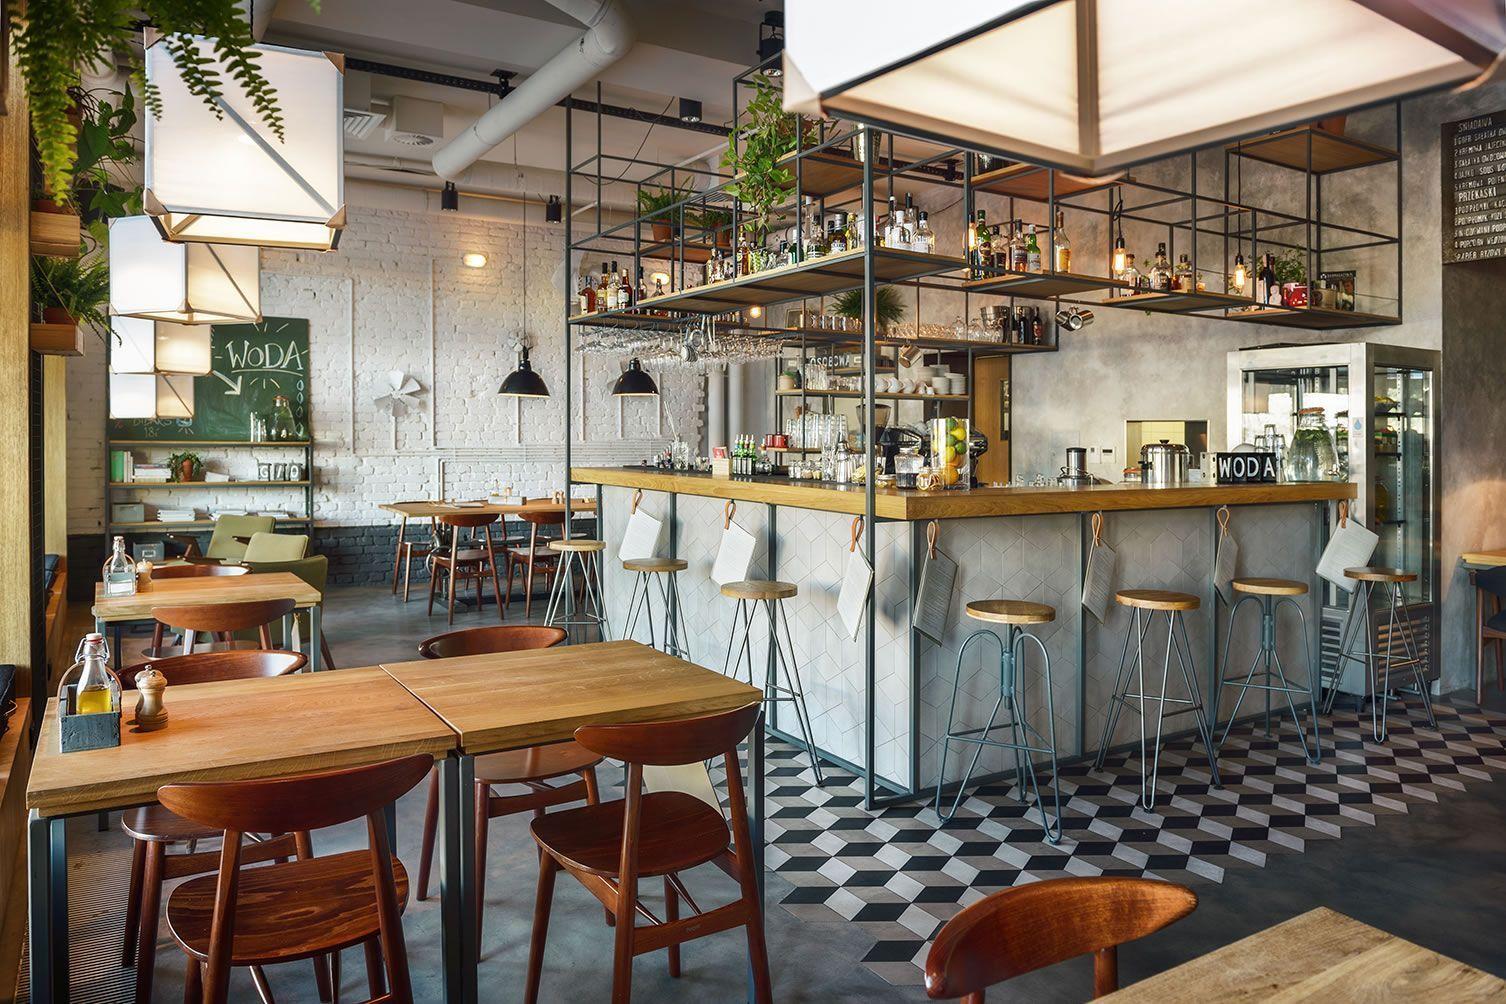 Desain Rumah Cafe Sederhana Desain Interior Restaurant Bar Interior